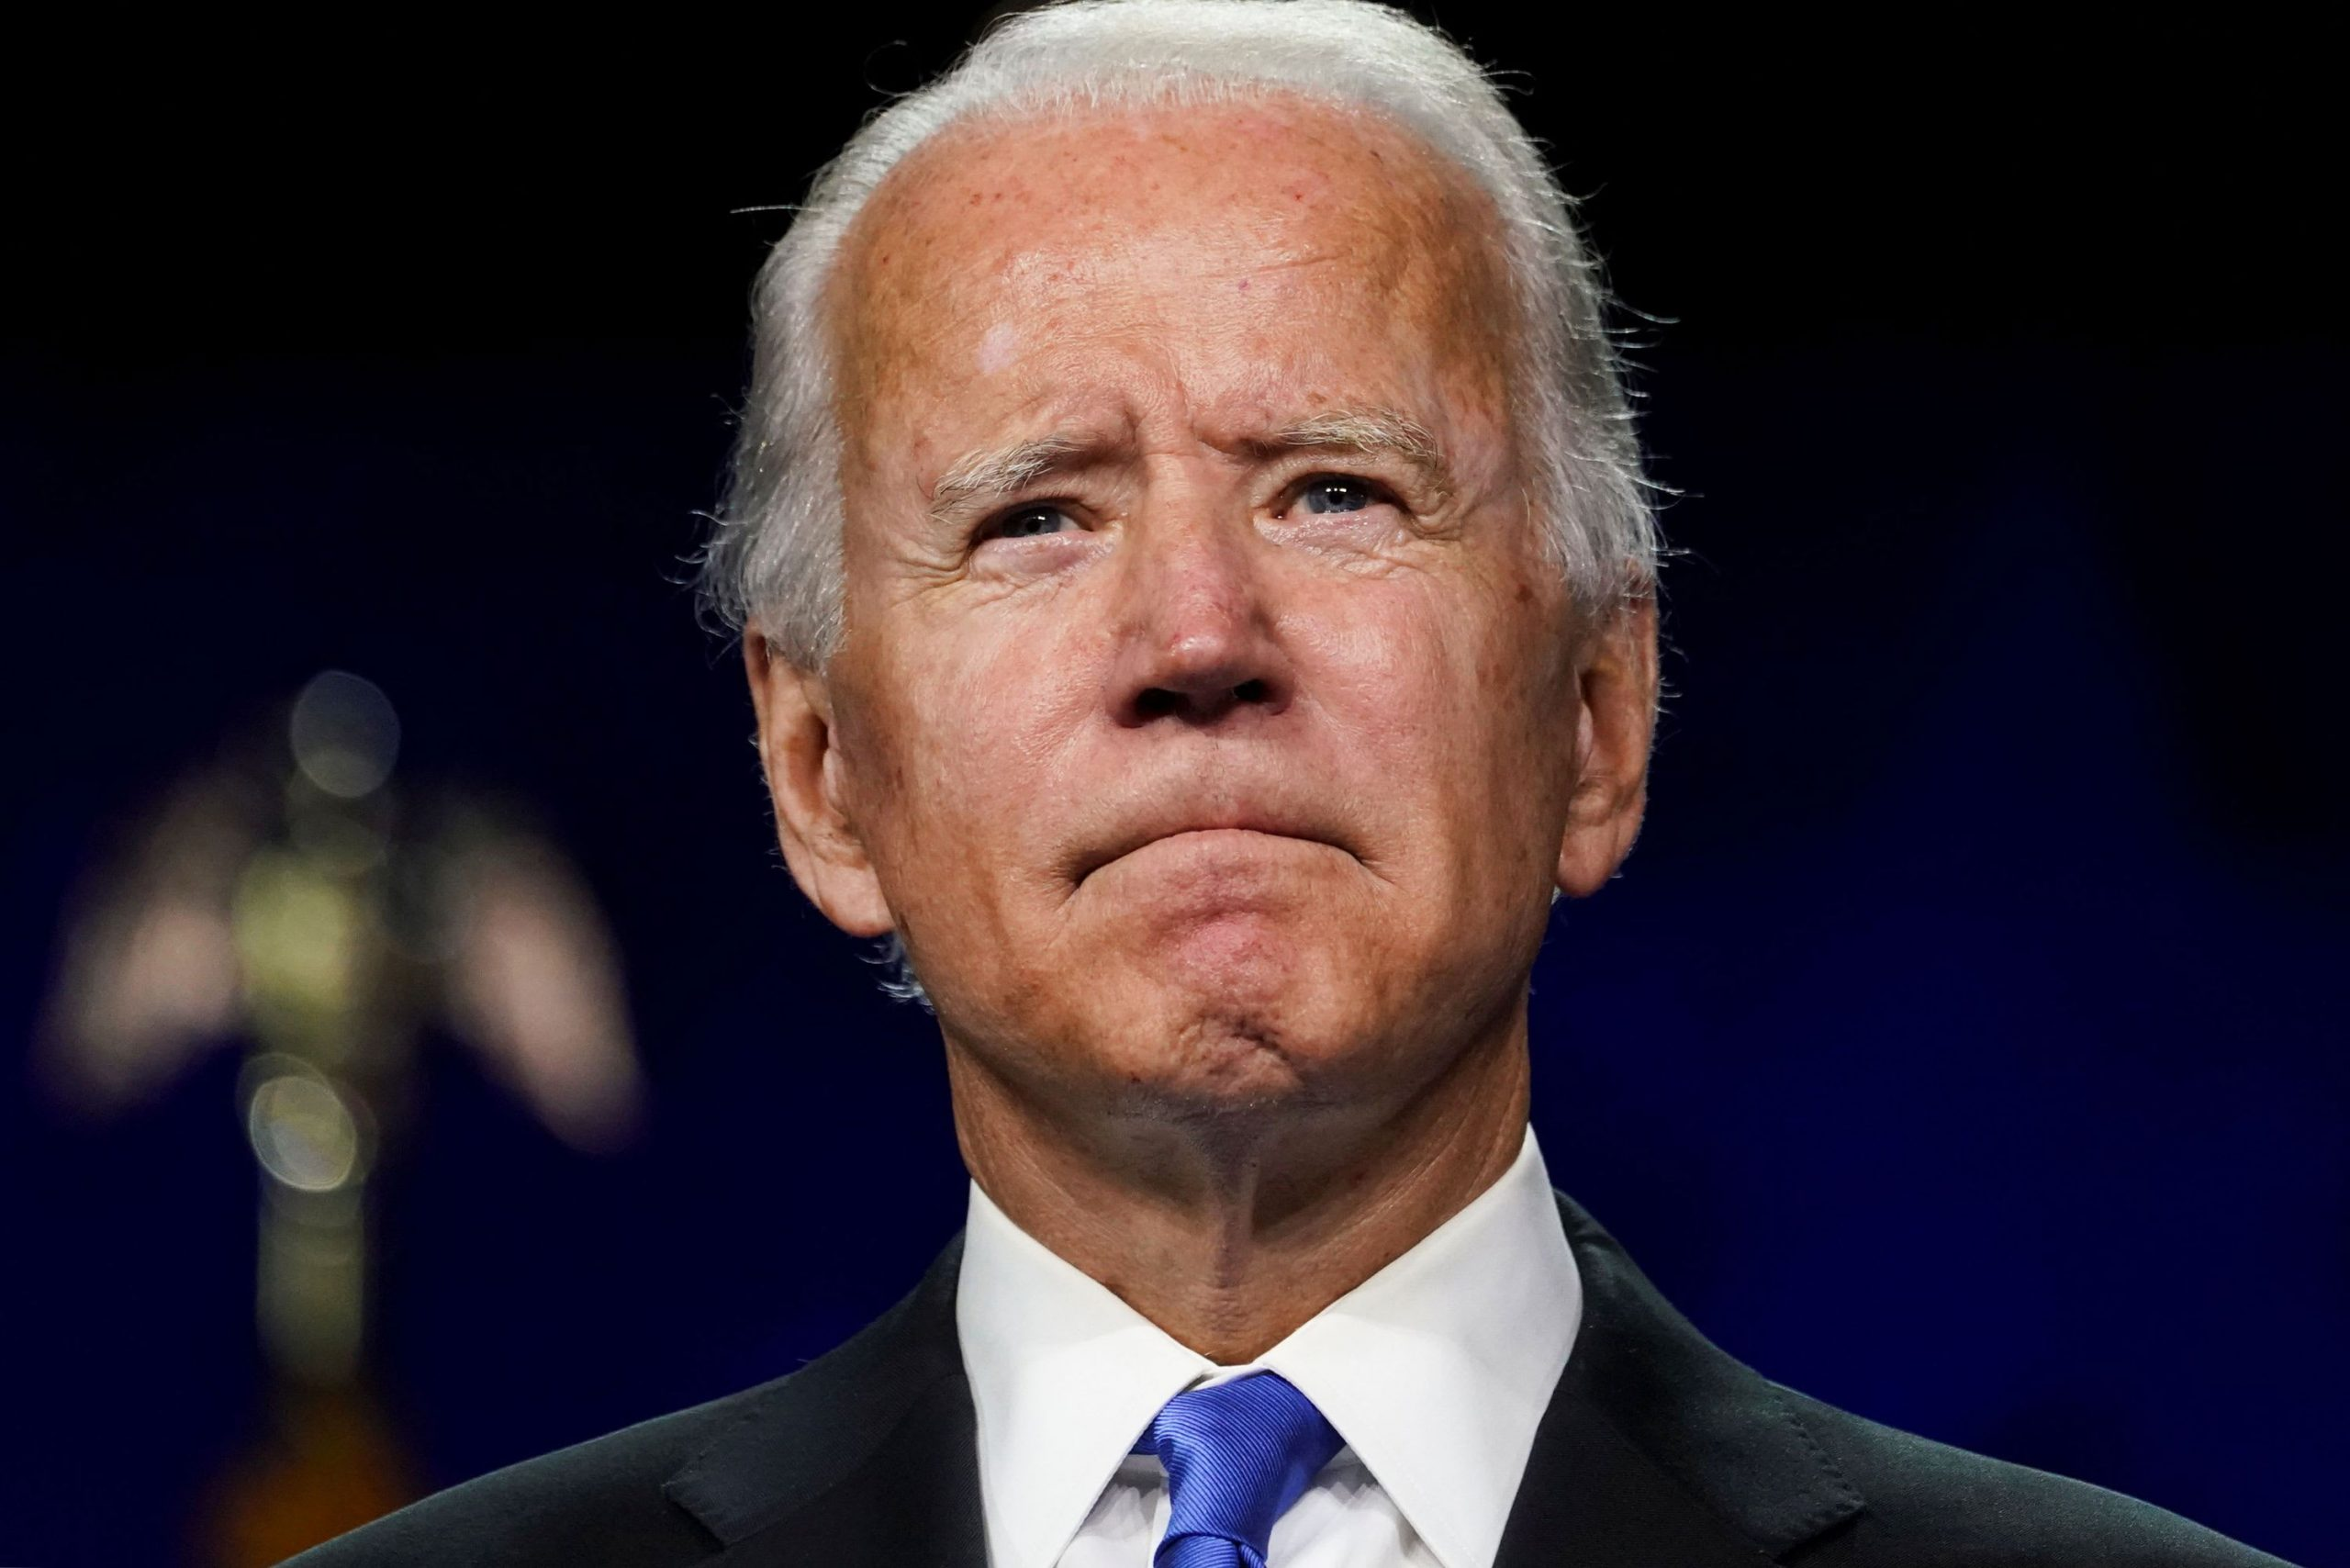 Joe Biden to Visit Iowa, Releases Ads to Inspire Latino Voters